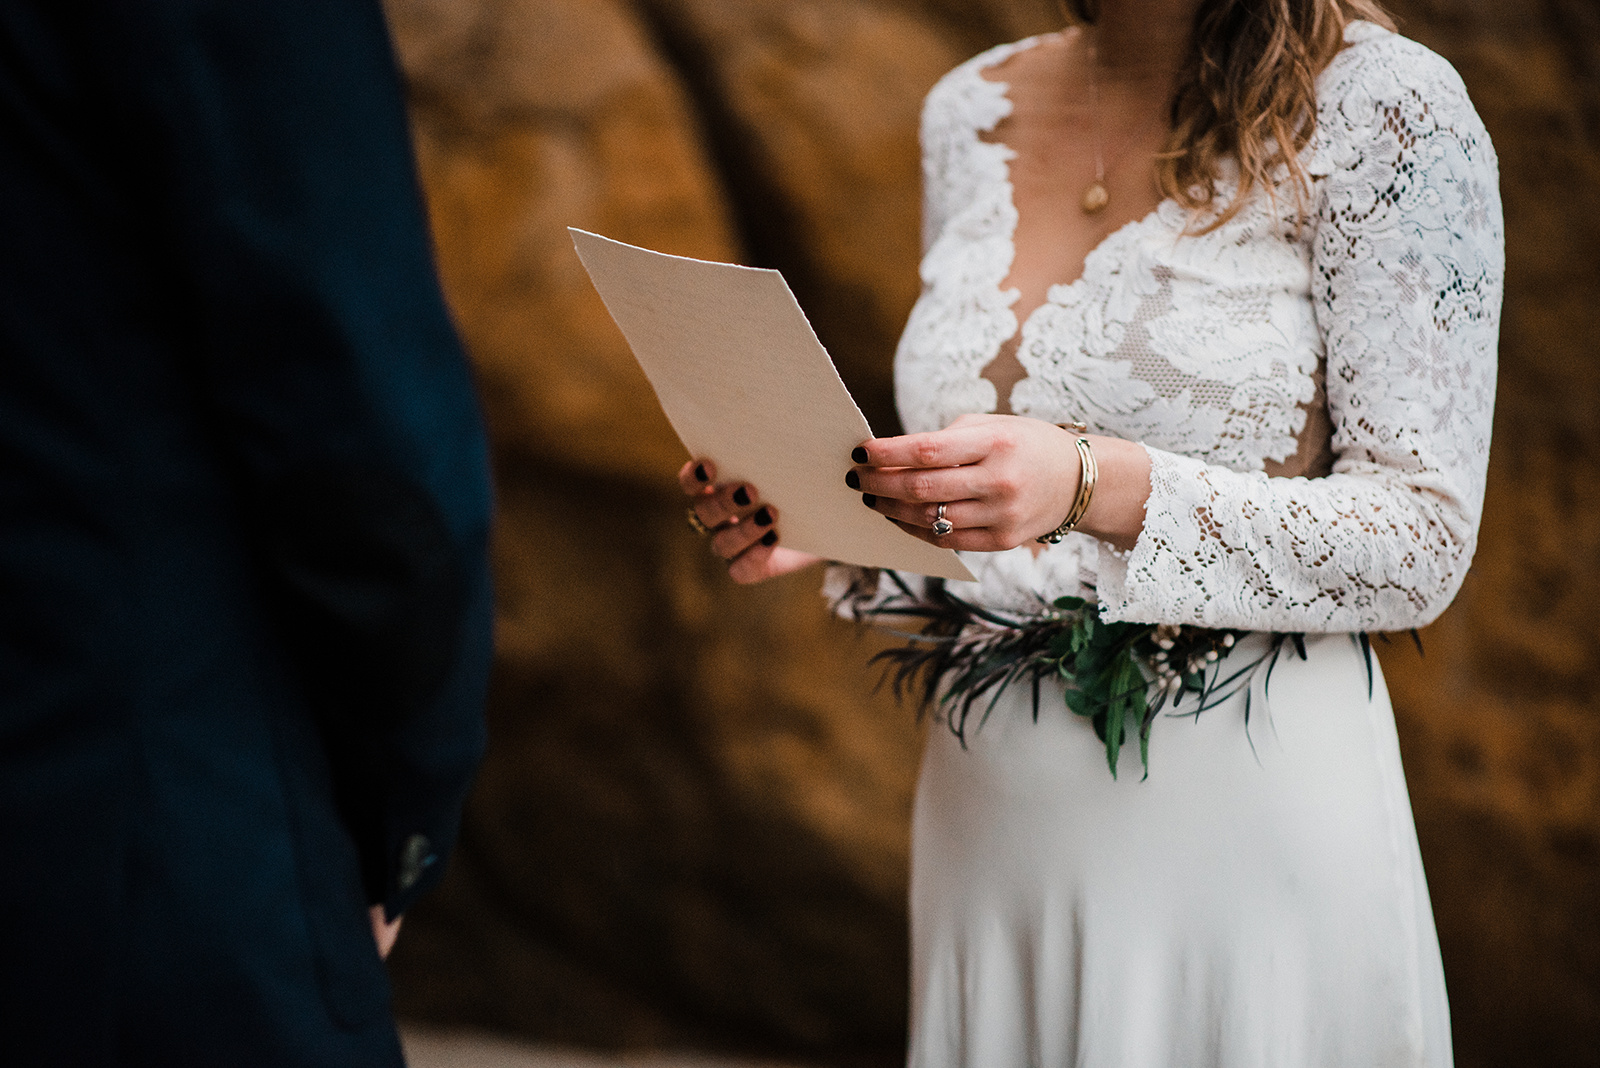 Oregon_Coast_Elopement_Wedding_The_Foxes_Photography_149.jpg